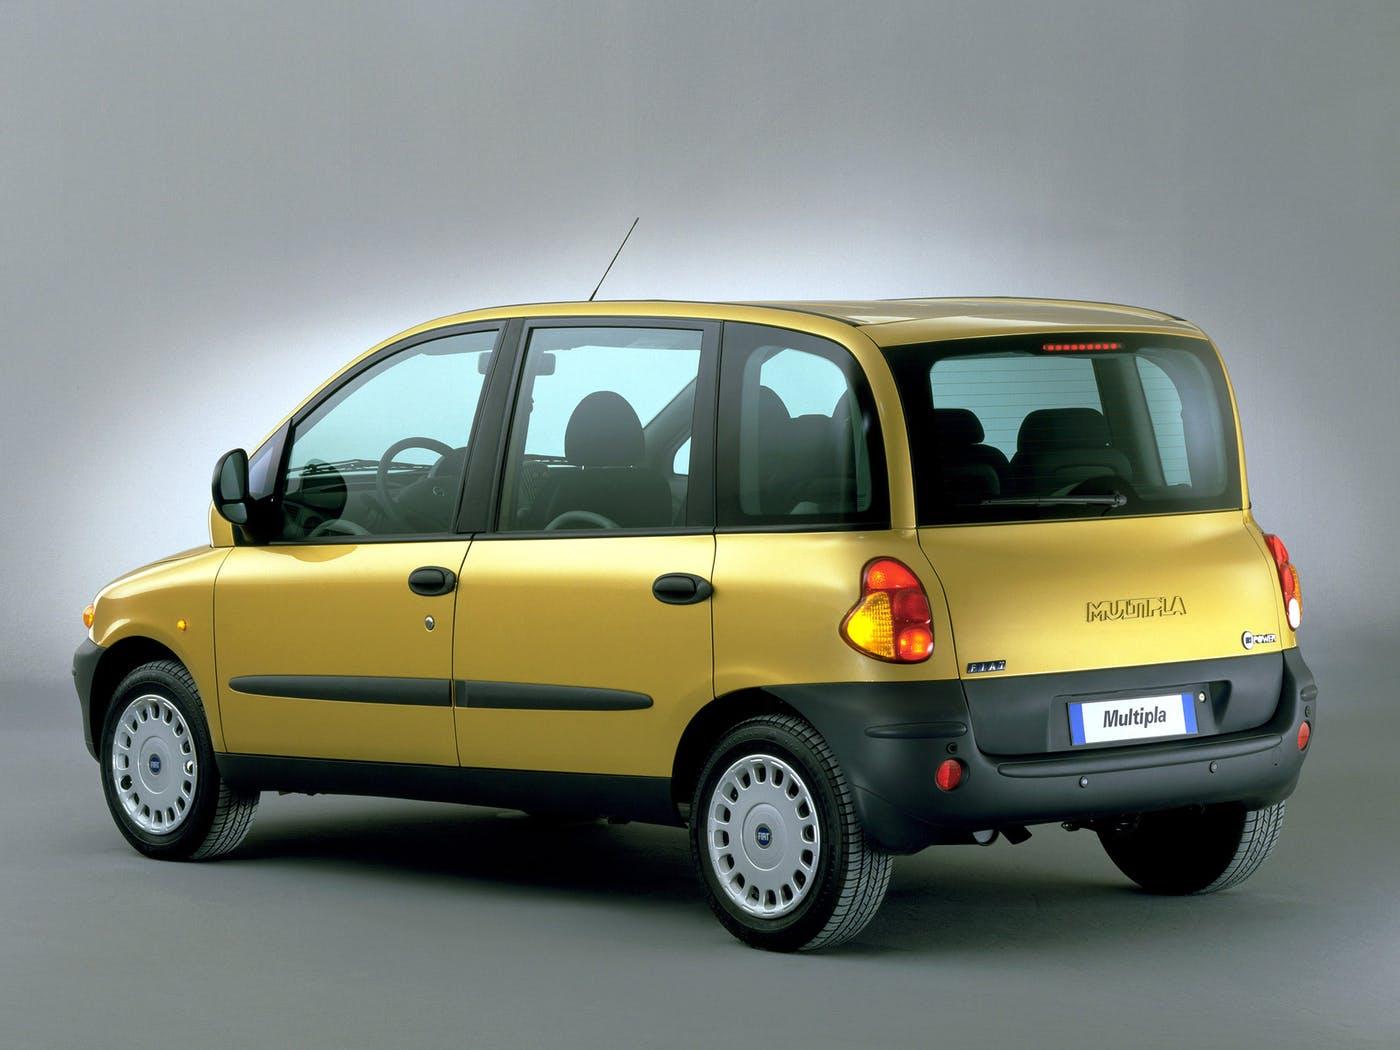 Fiat Multipla I Restyling 2004 - 2010 Compact MPV #1